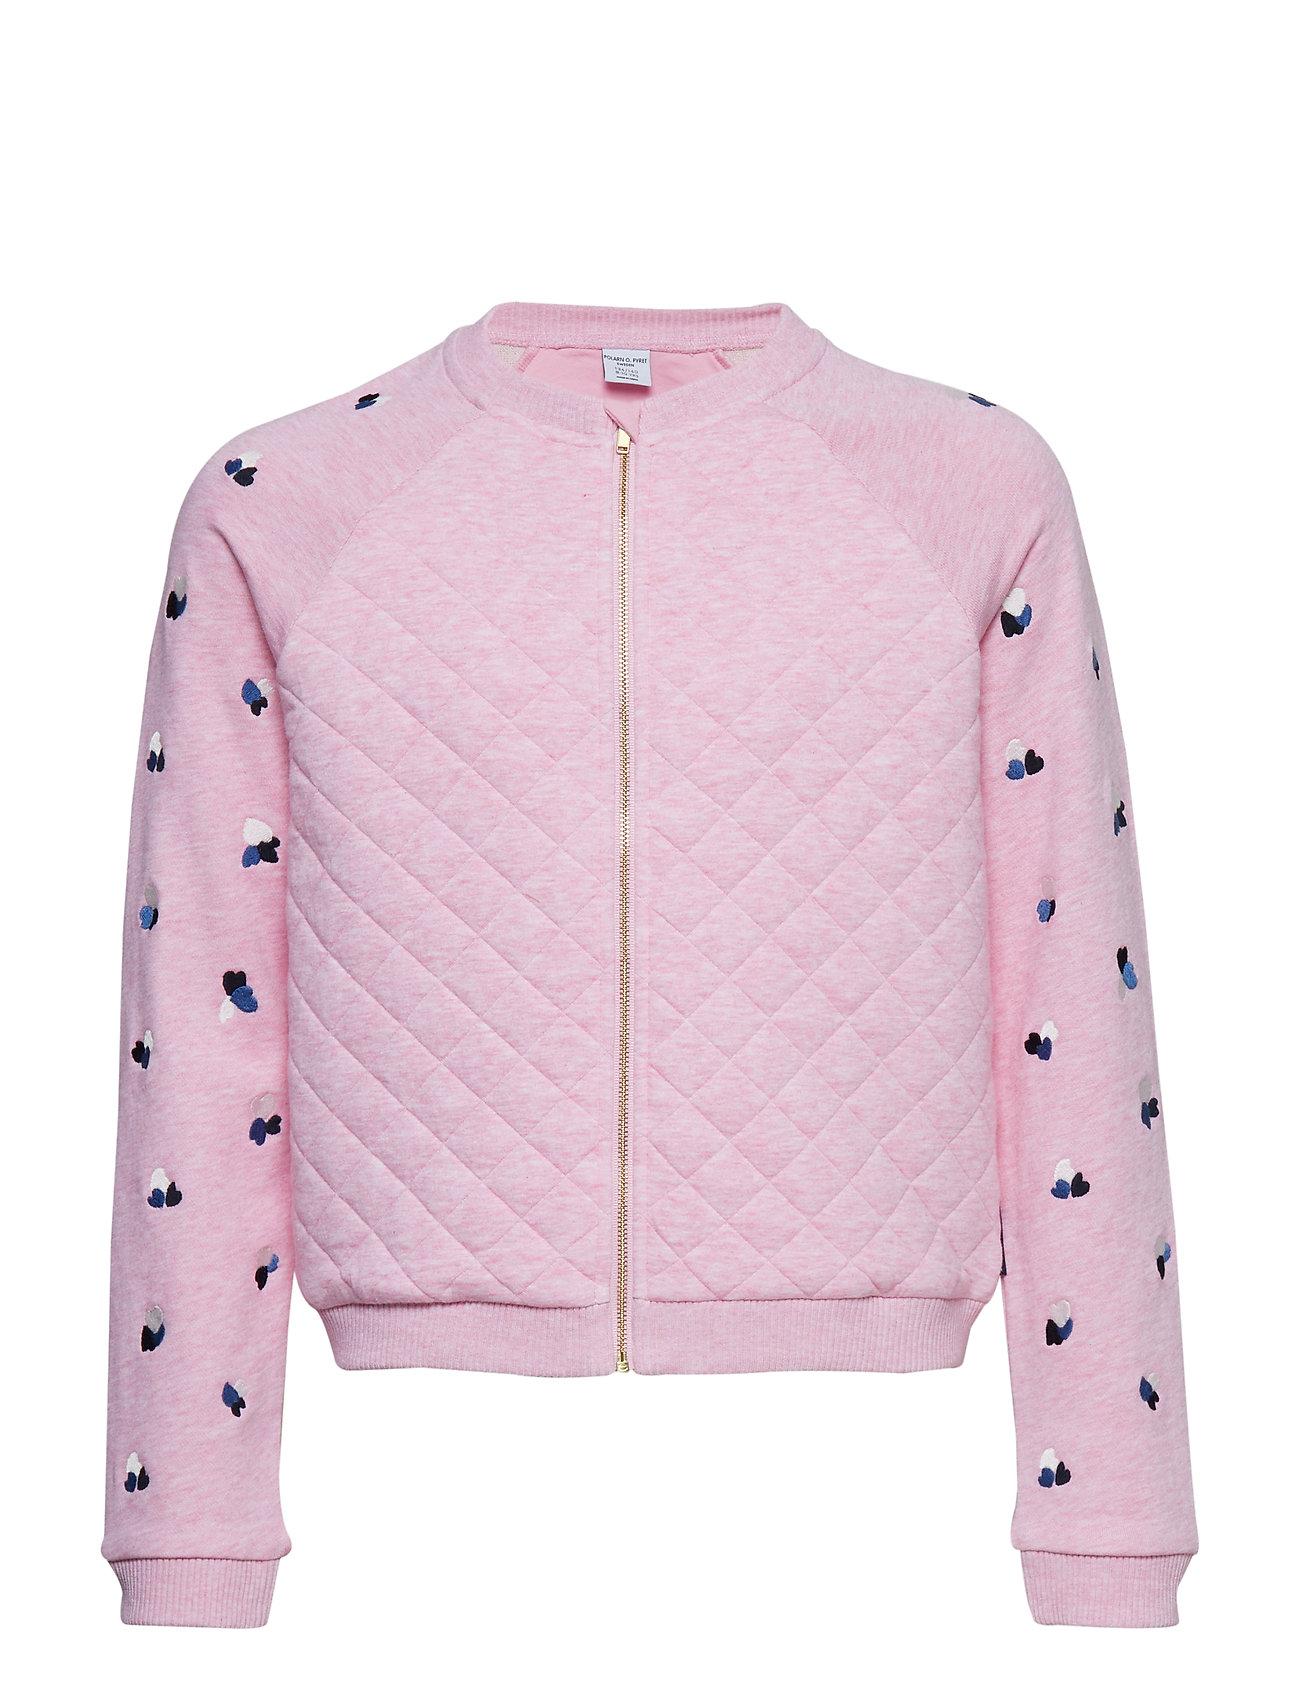 Polarn O. Pyret Zip up sweater School